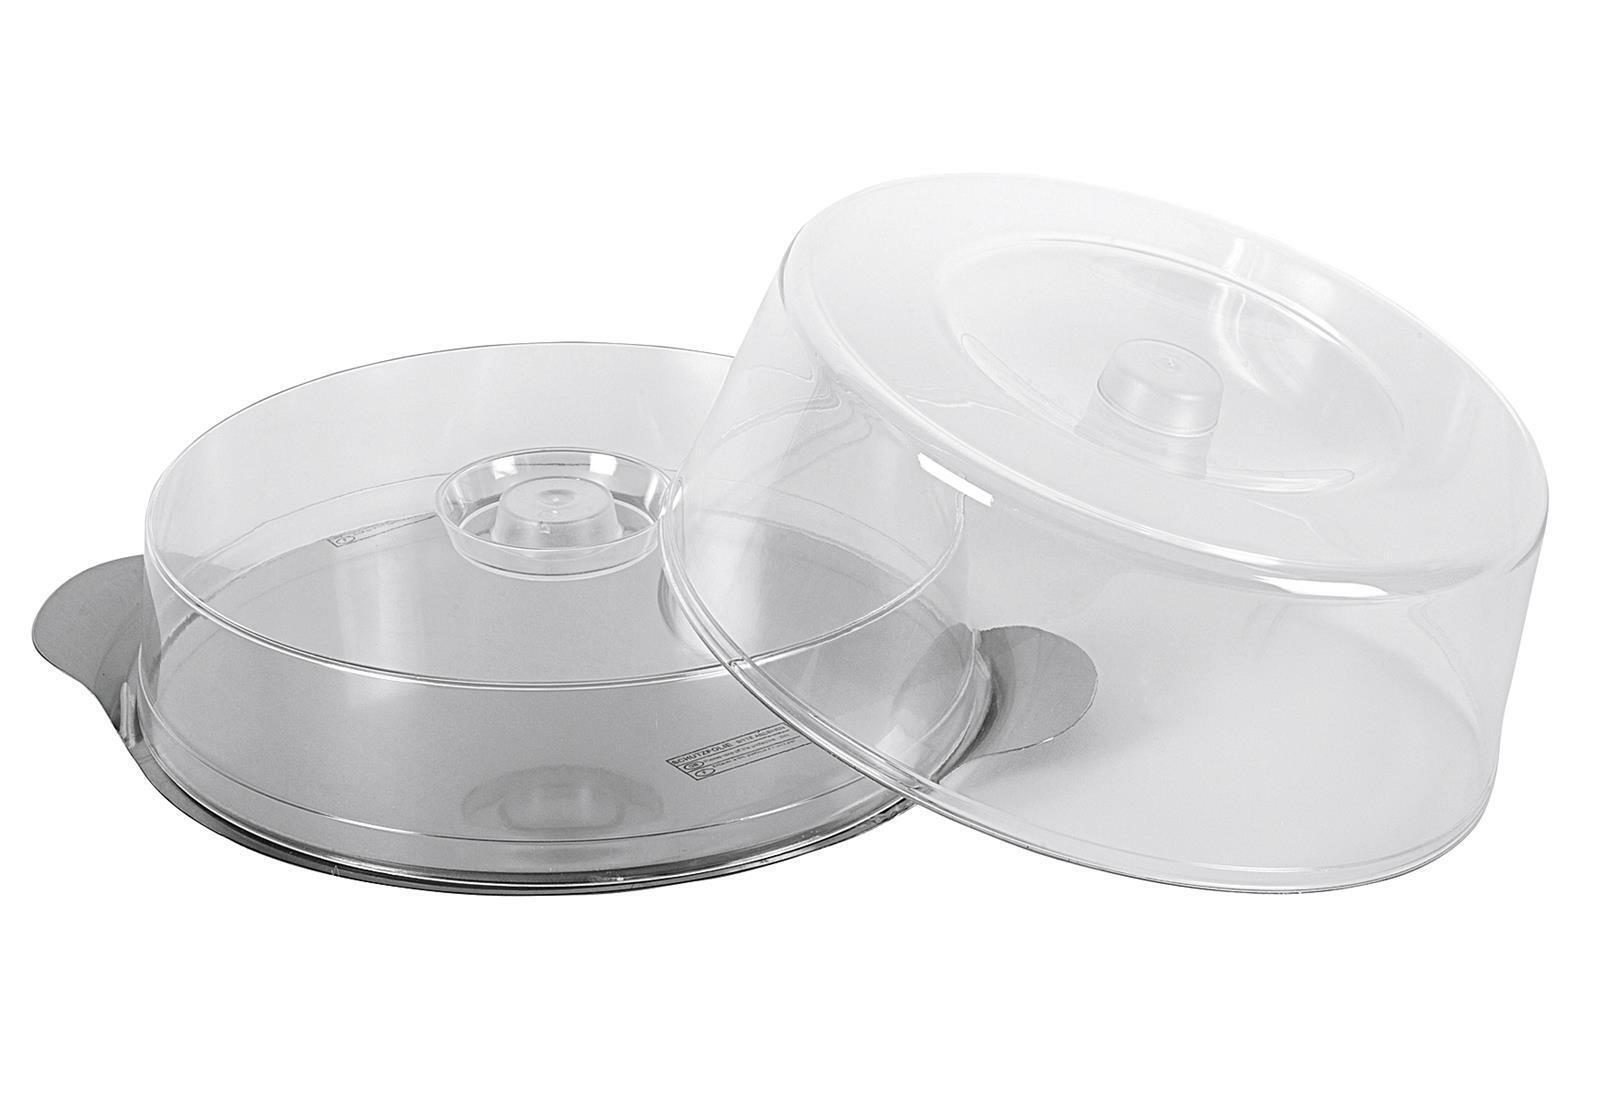 Acrylglas sp/ülmaschinengeeignet 30 cm Haube f/ür Tortenplatte WMF Tortenhaube